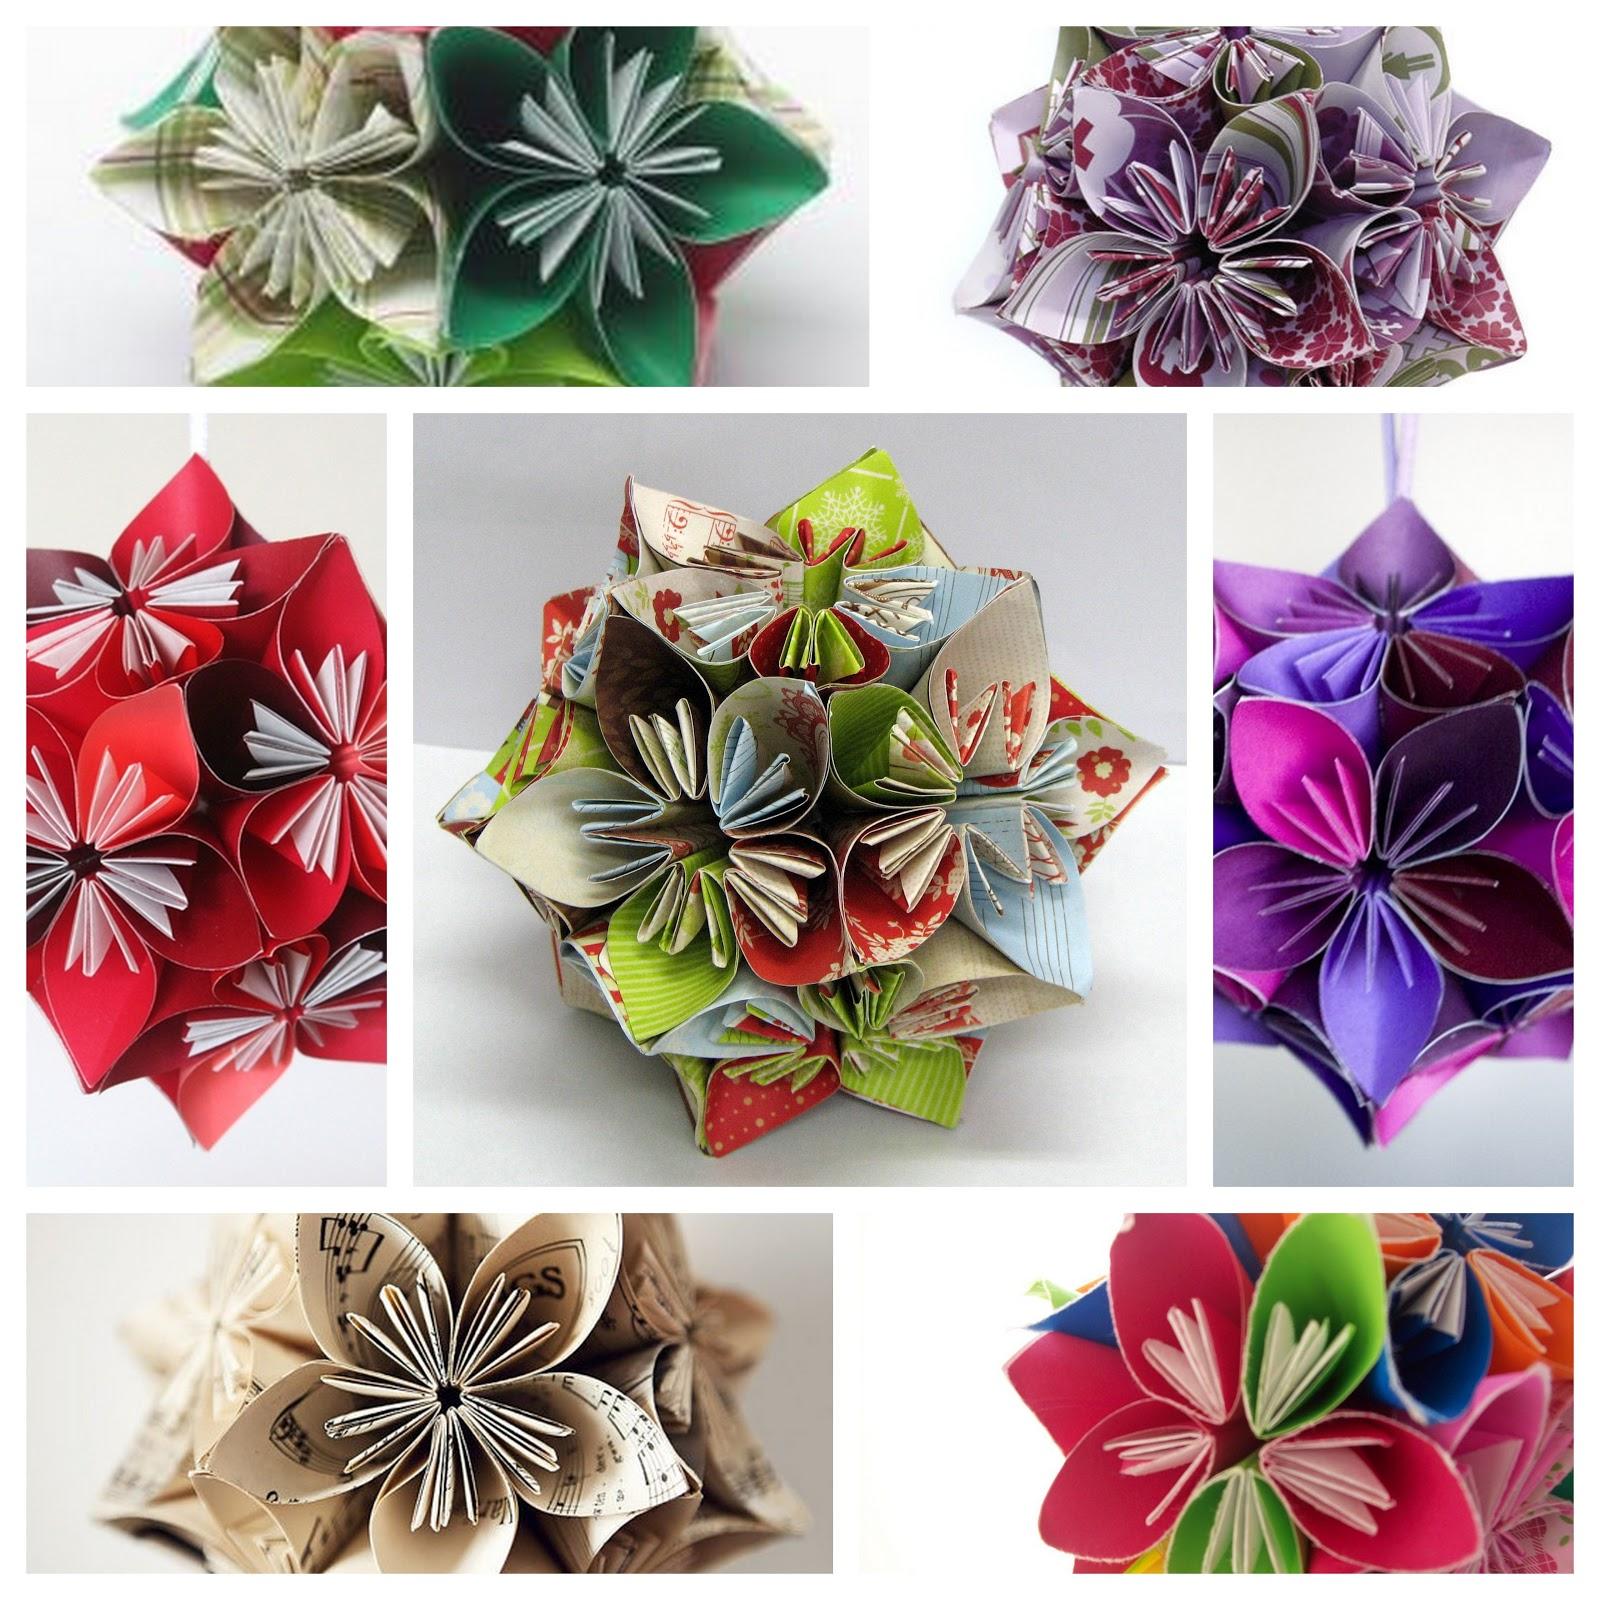 Christmas Paper Craft Ideas - Laura Williams